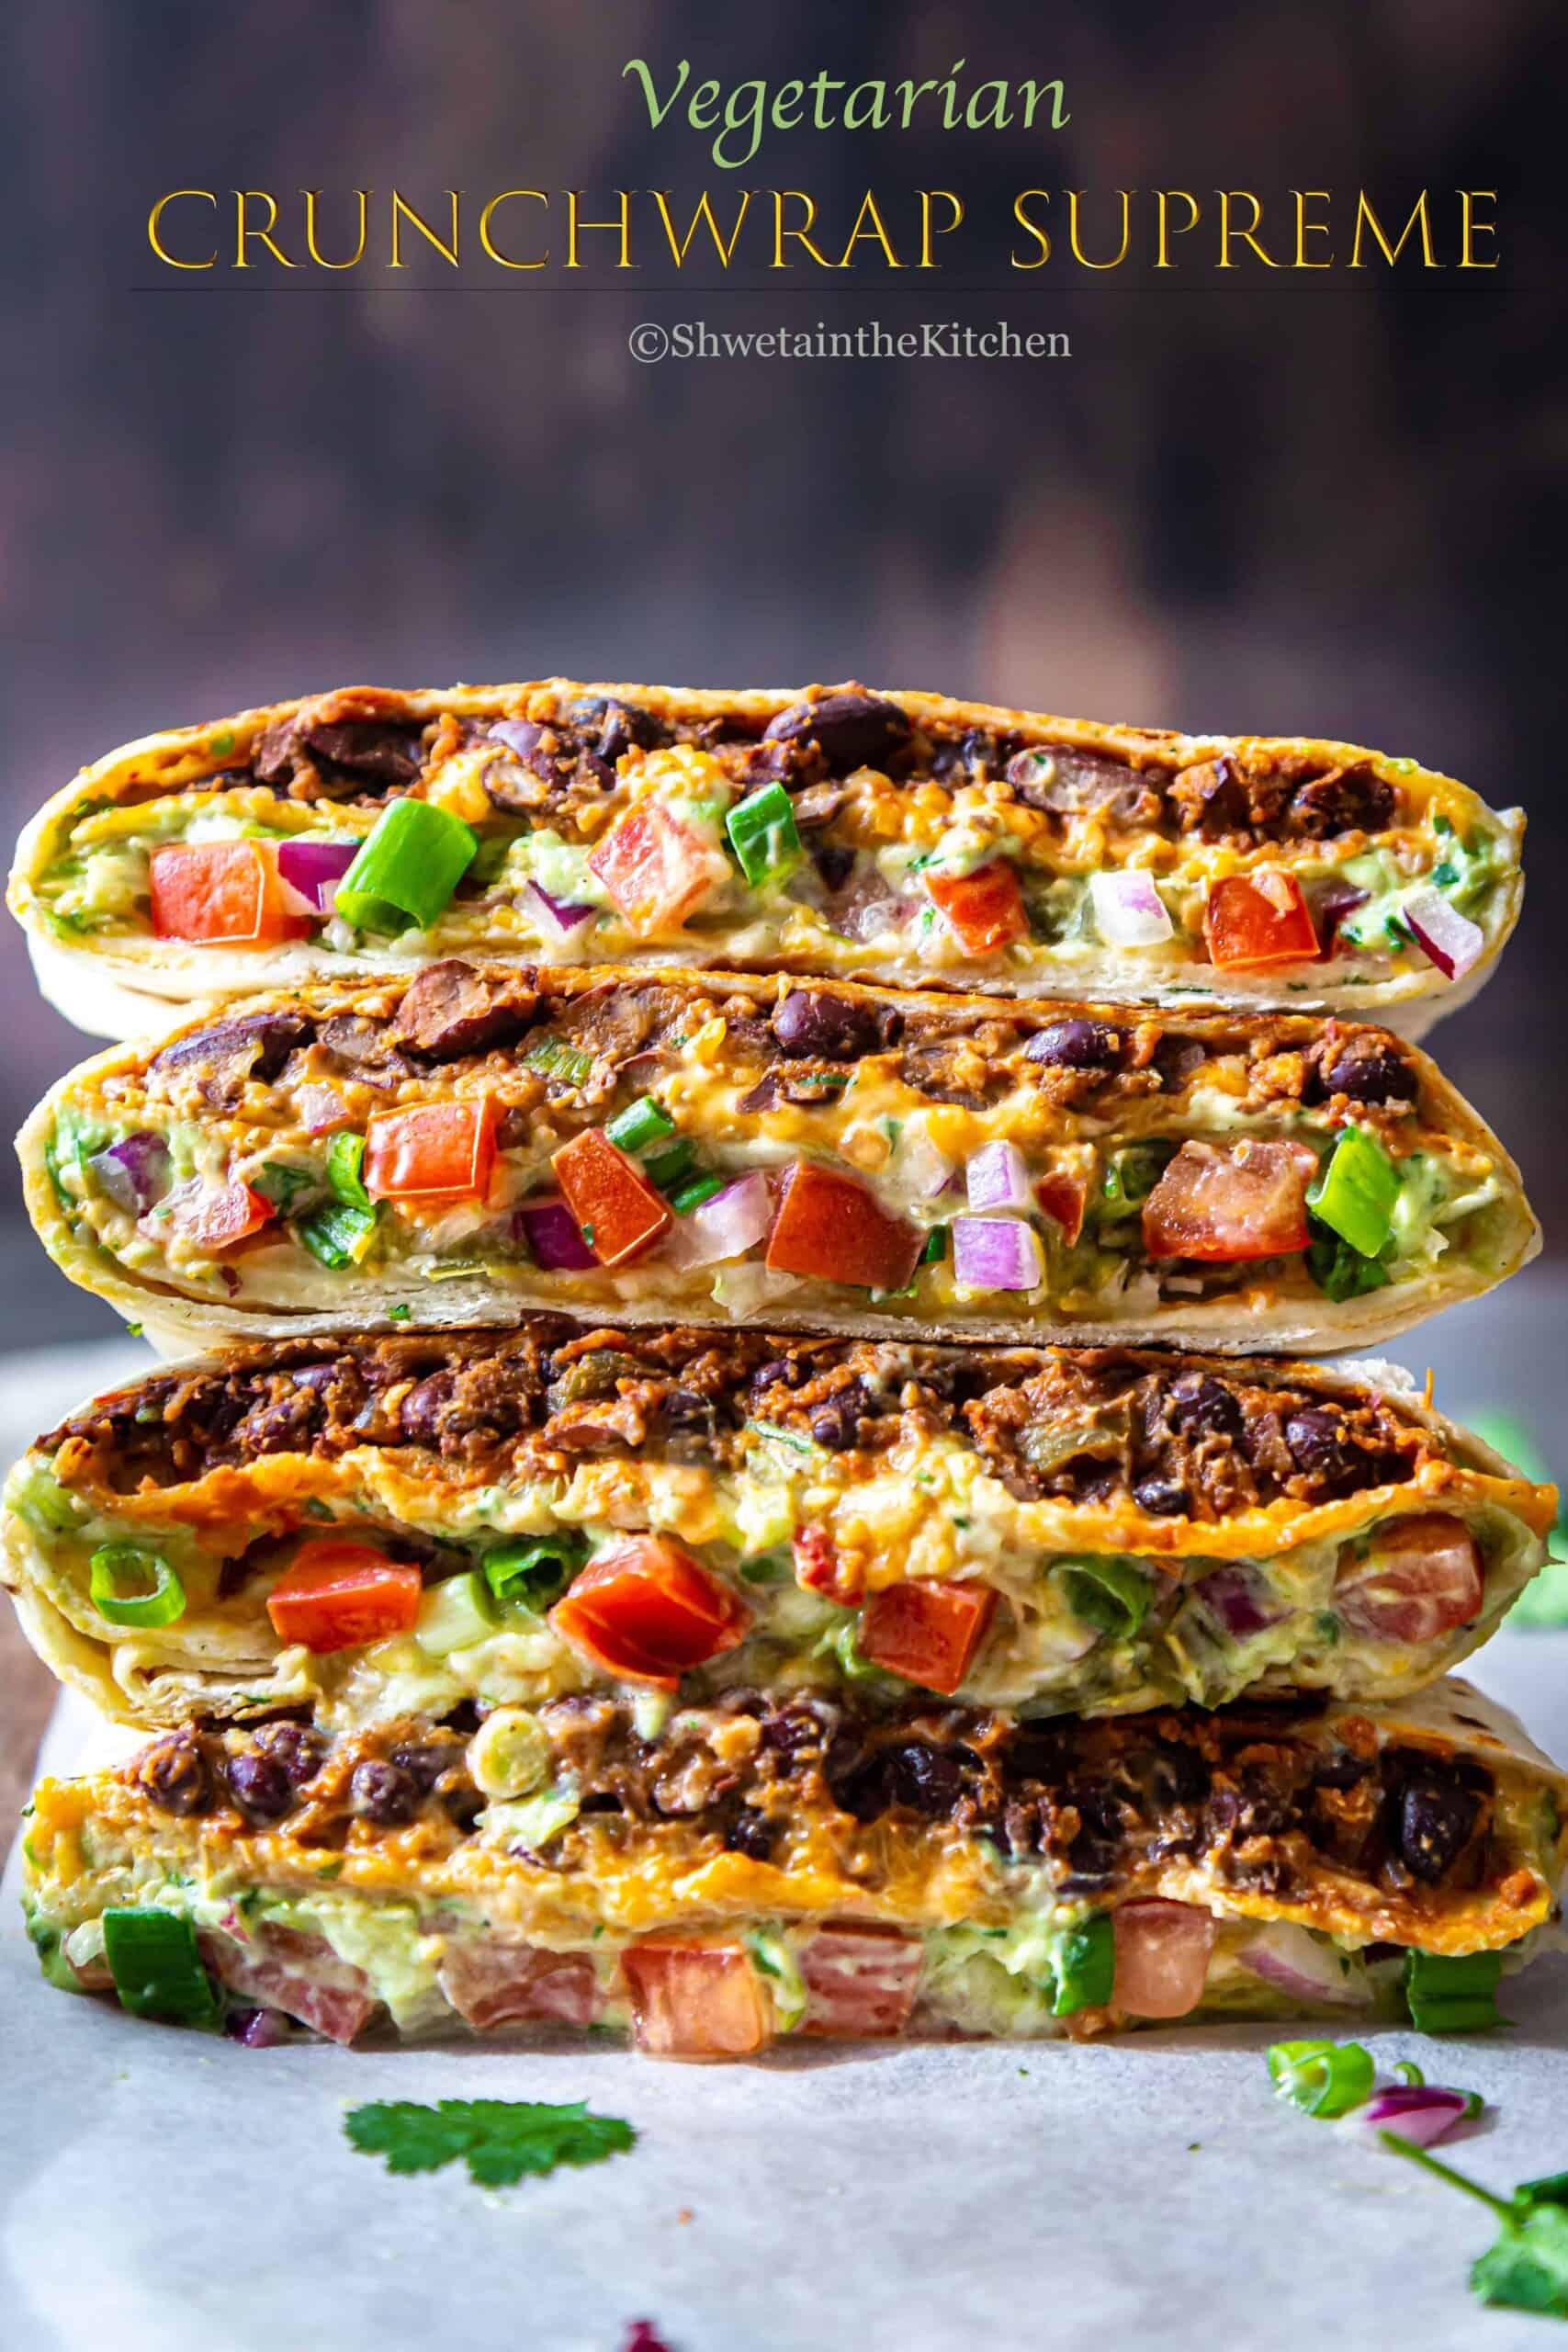 Vegetarian Crunchwrap Supreme